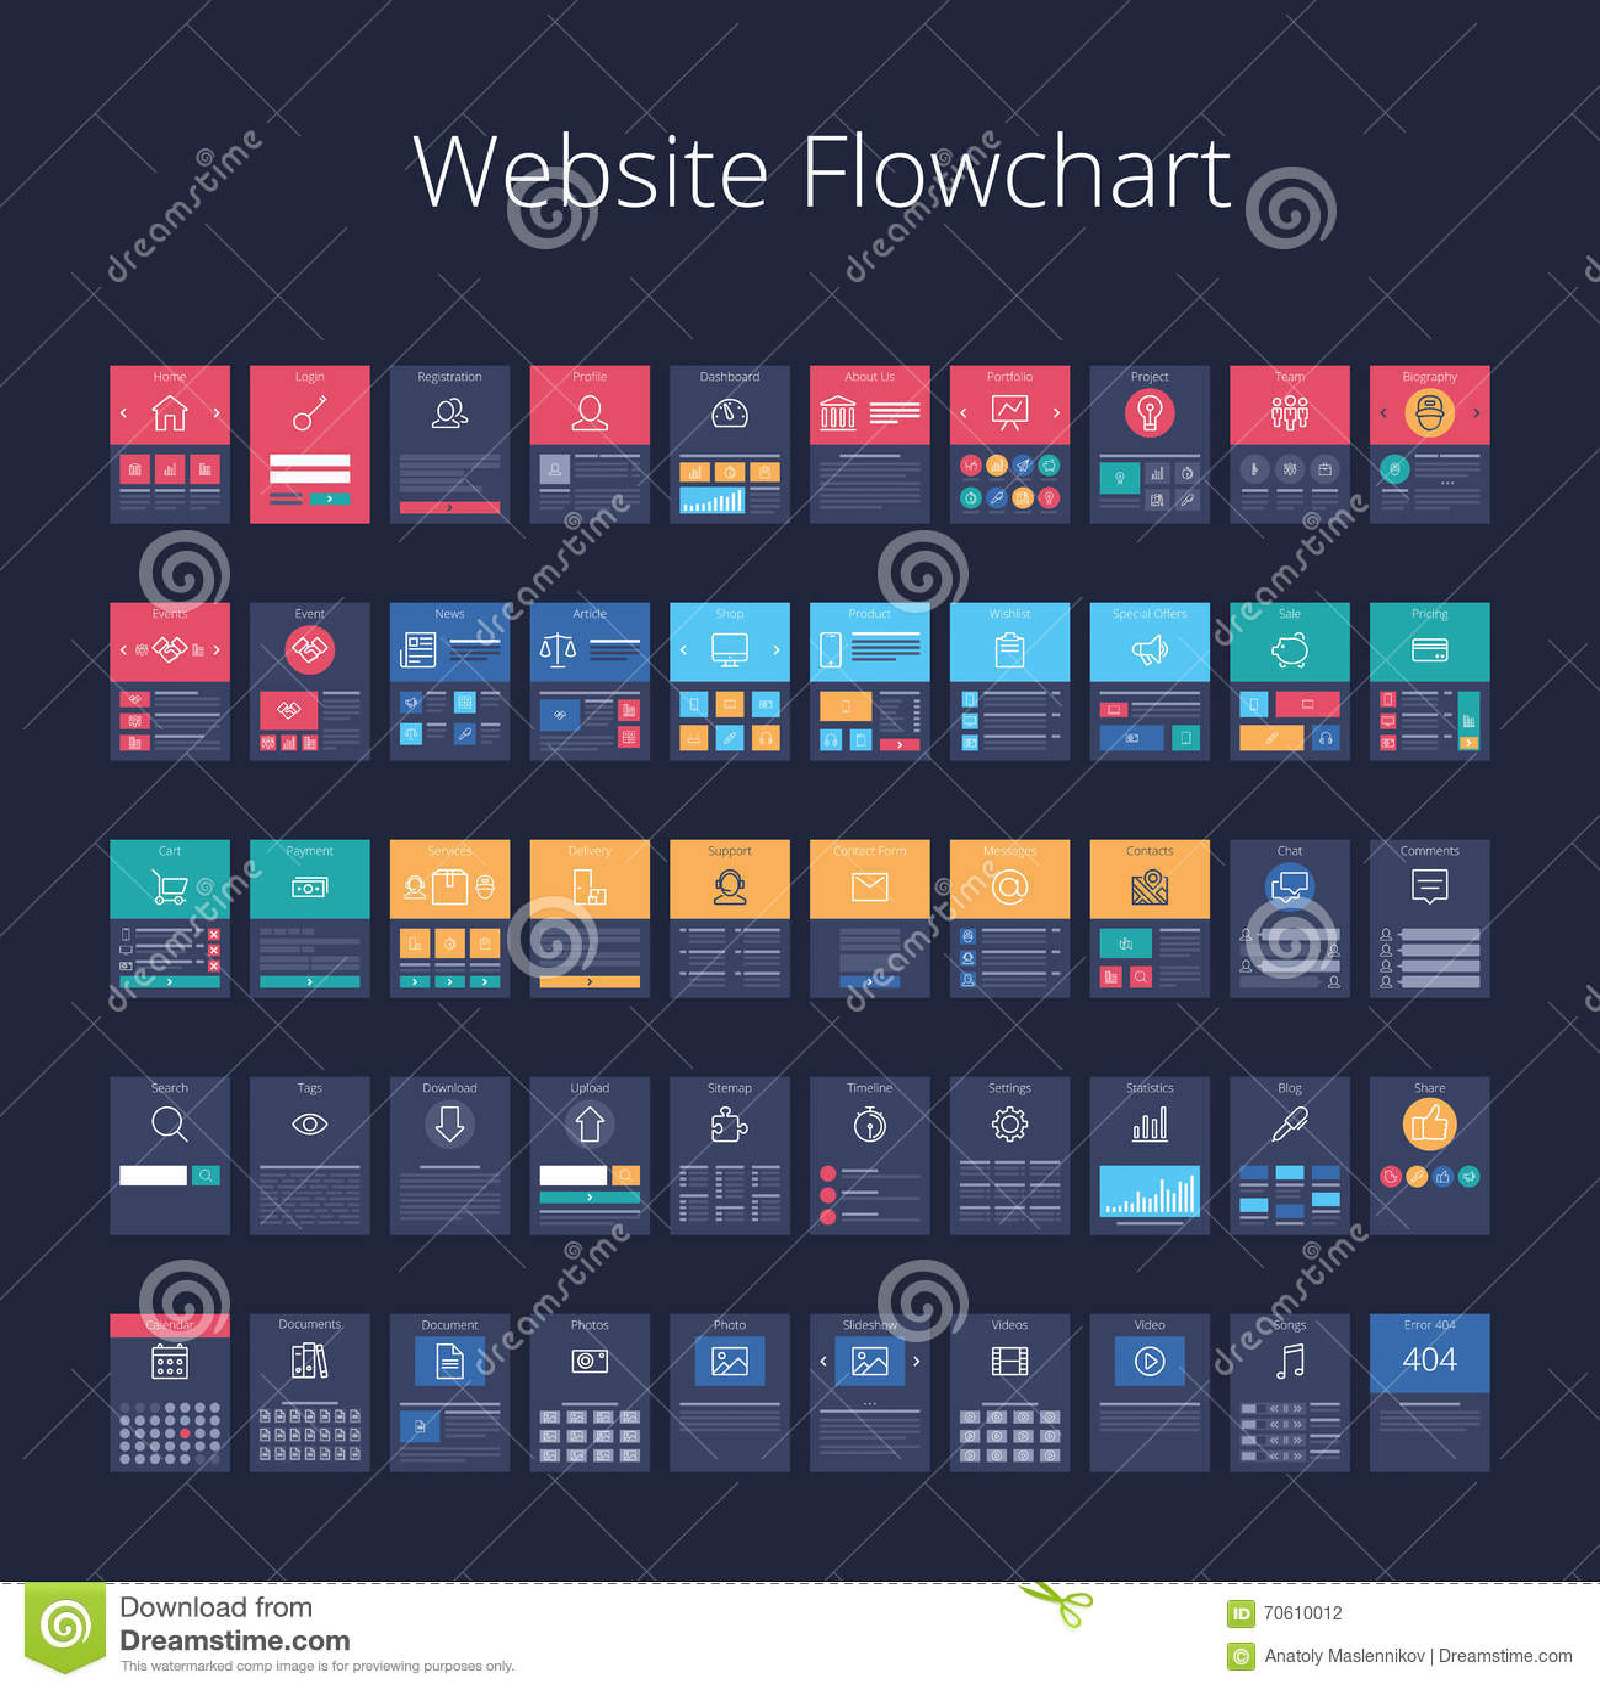 Схема технологического процесса вебсайта